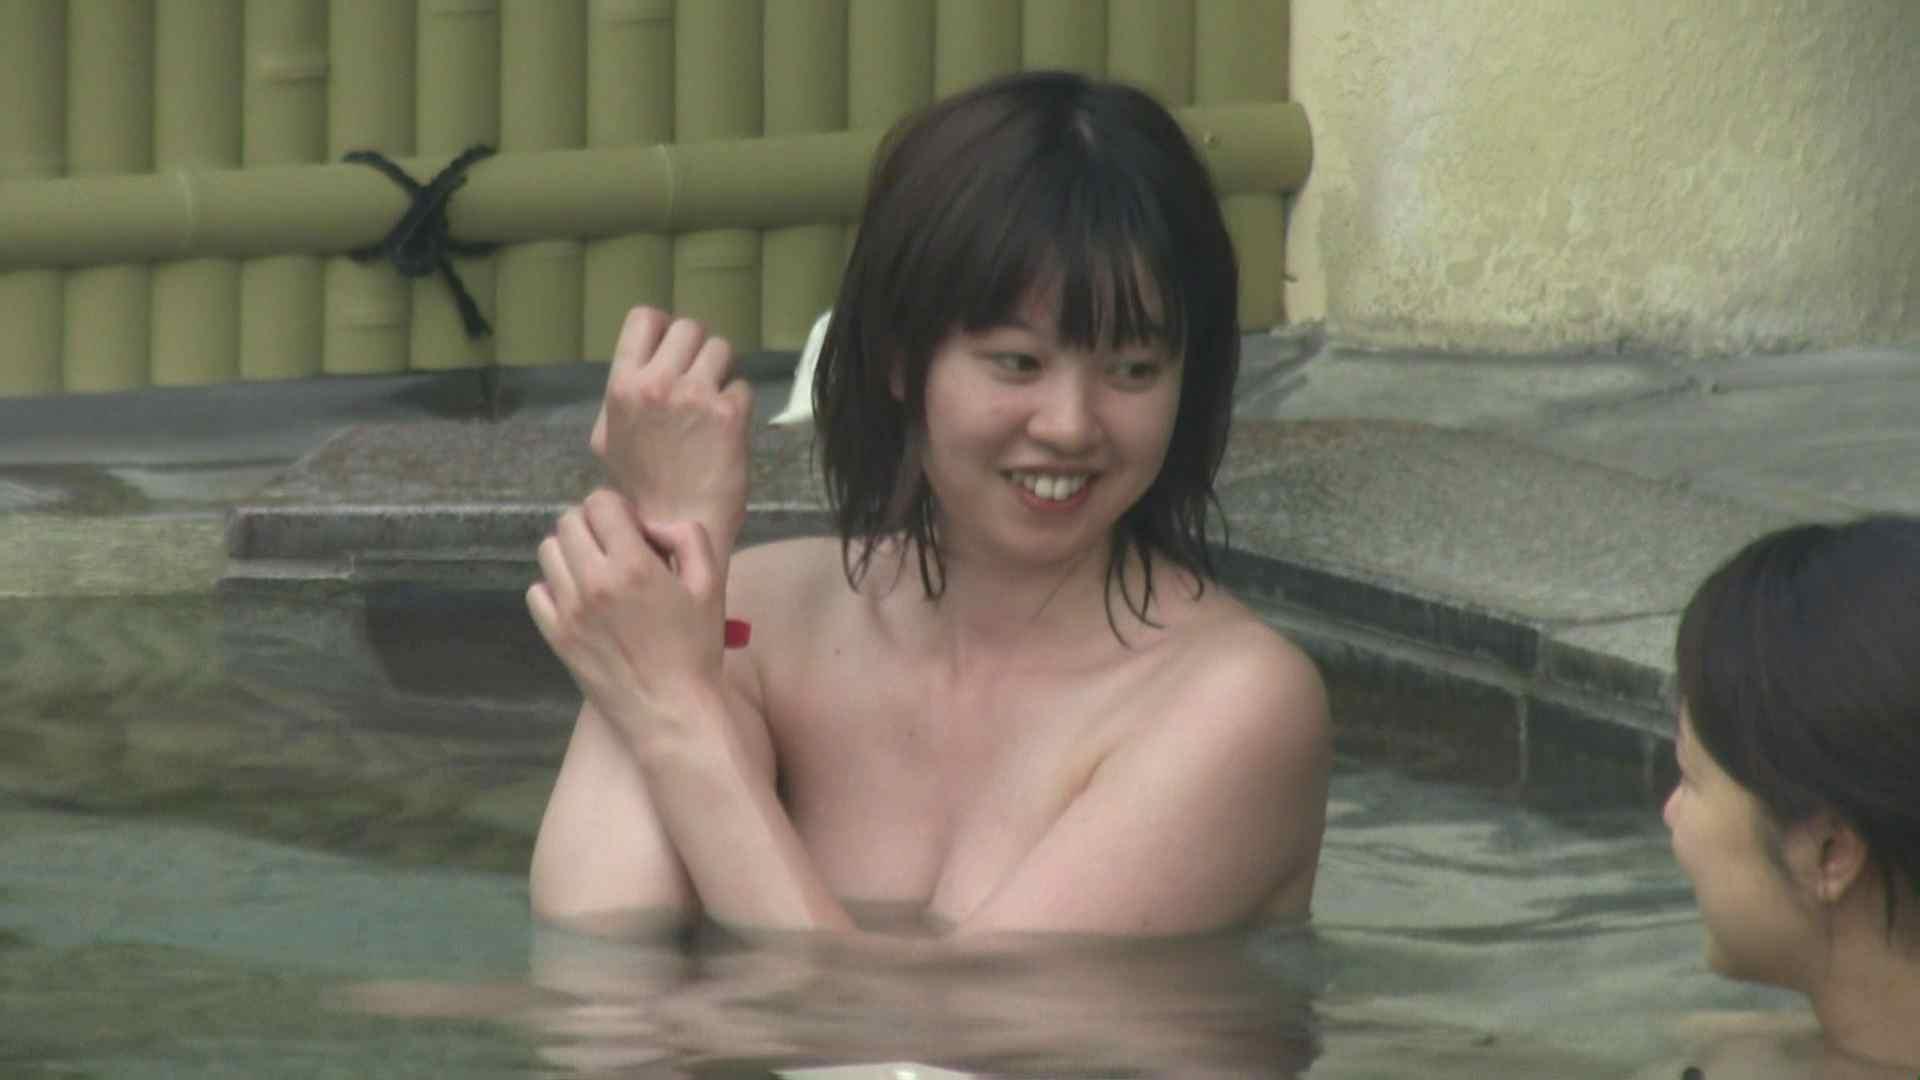 高画質露天女風呂観察 vol.030 露天 えろ無修正画像 99枚 52